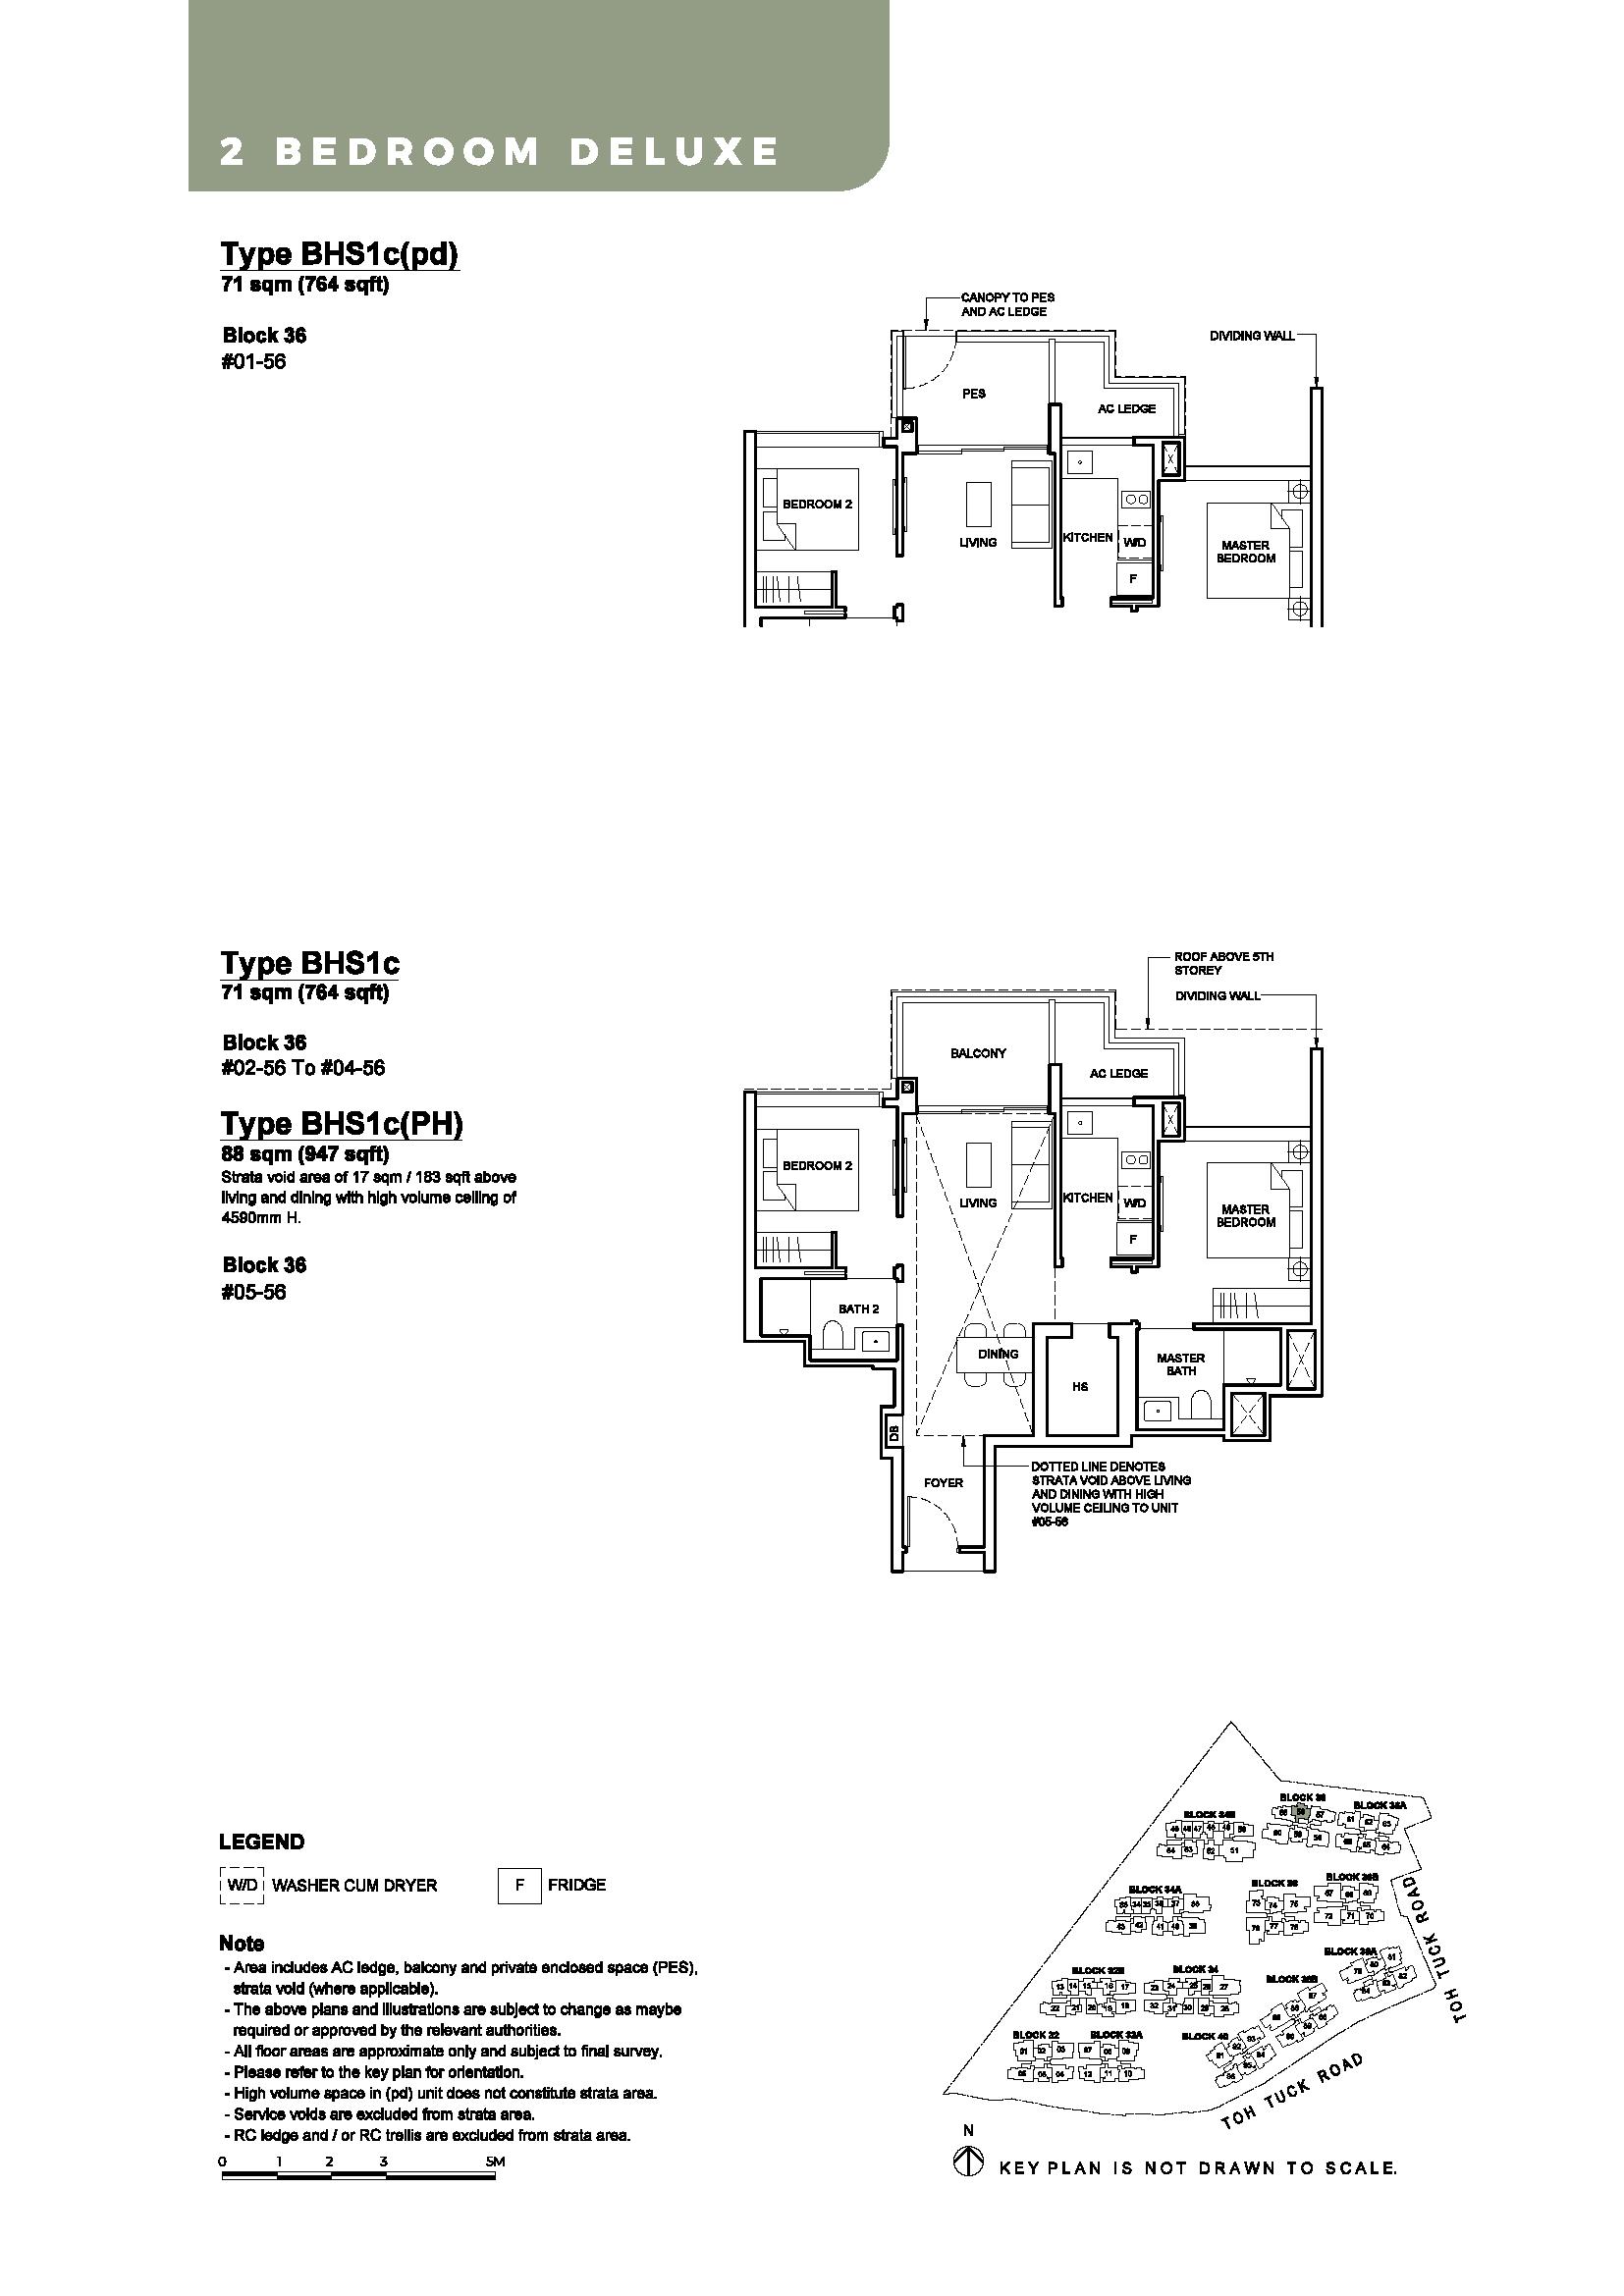 Type BHS1c - BHS1c(pd) - BHS1c(PH)